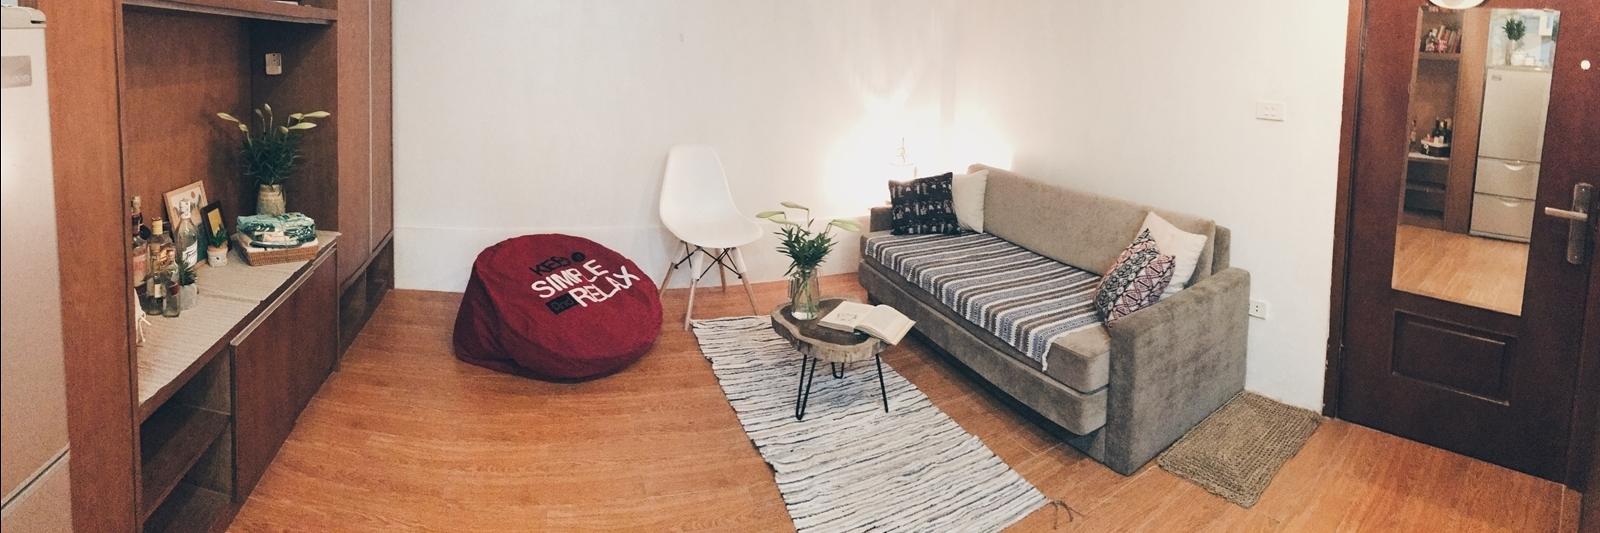 https://gody.vn/blog/review-homestay-hostel-resort/post/rung-tim-voi-5-homestay-sieu-xinh-xan-giua-long-ha-noi-1448